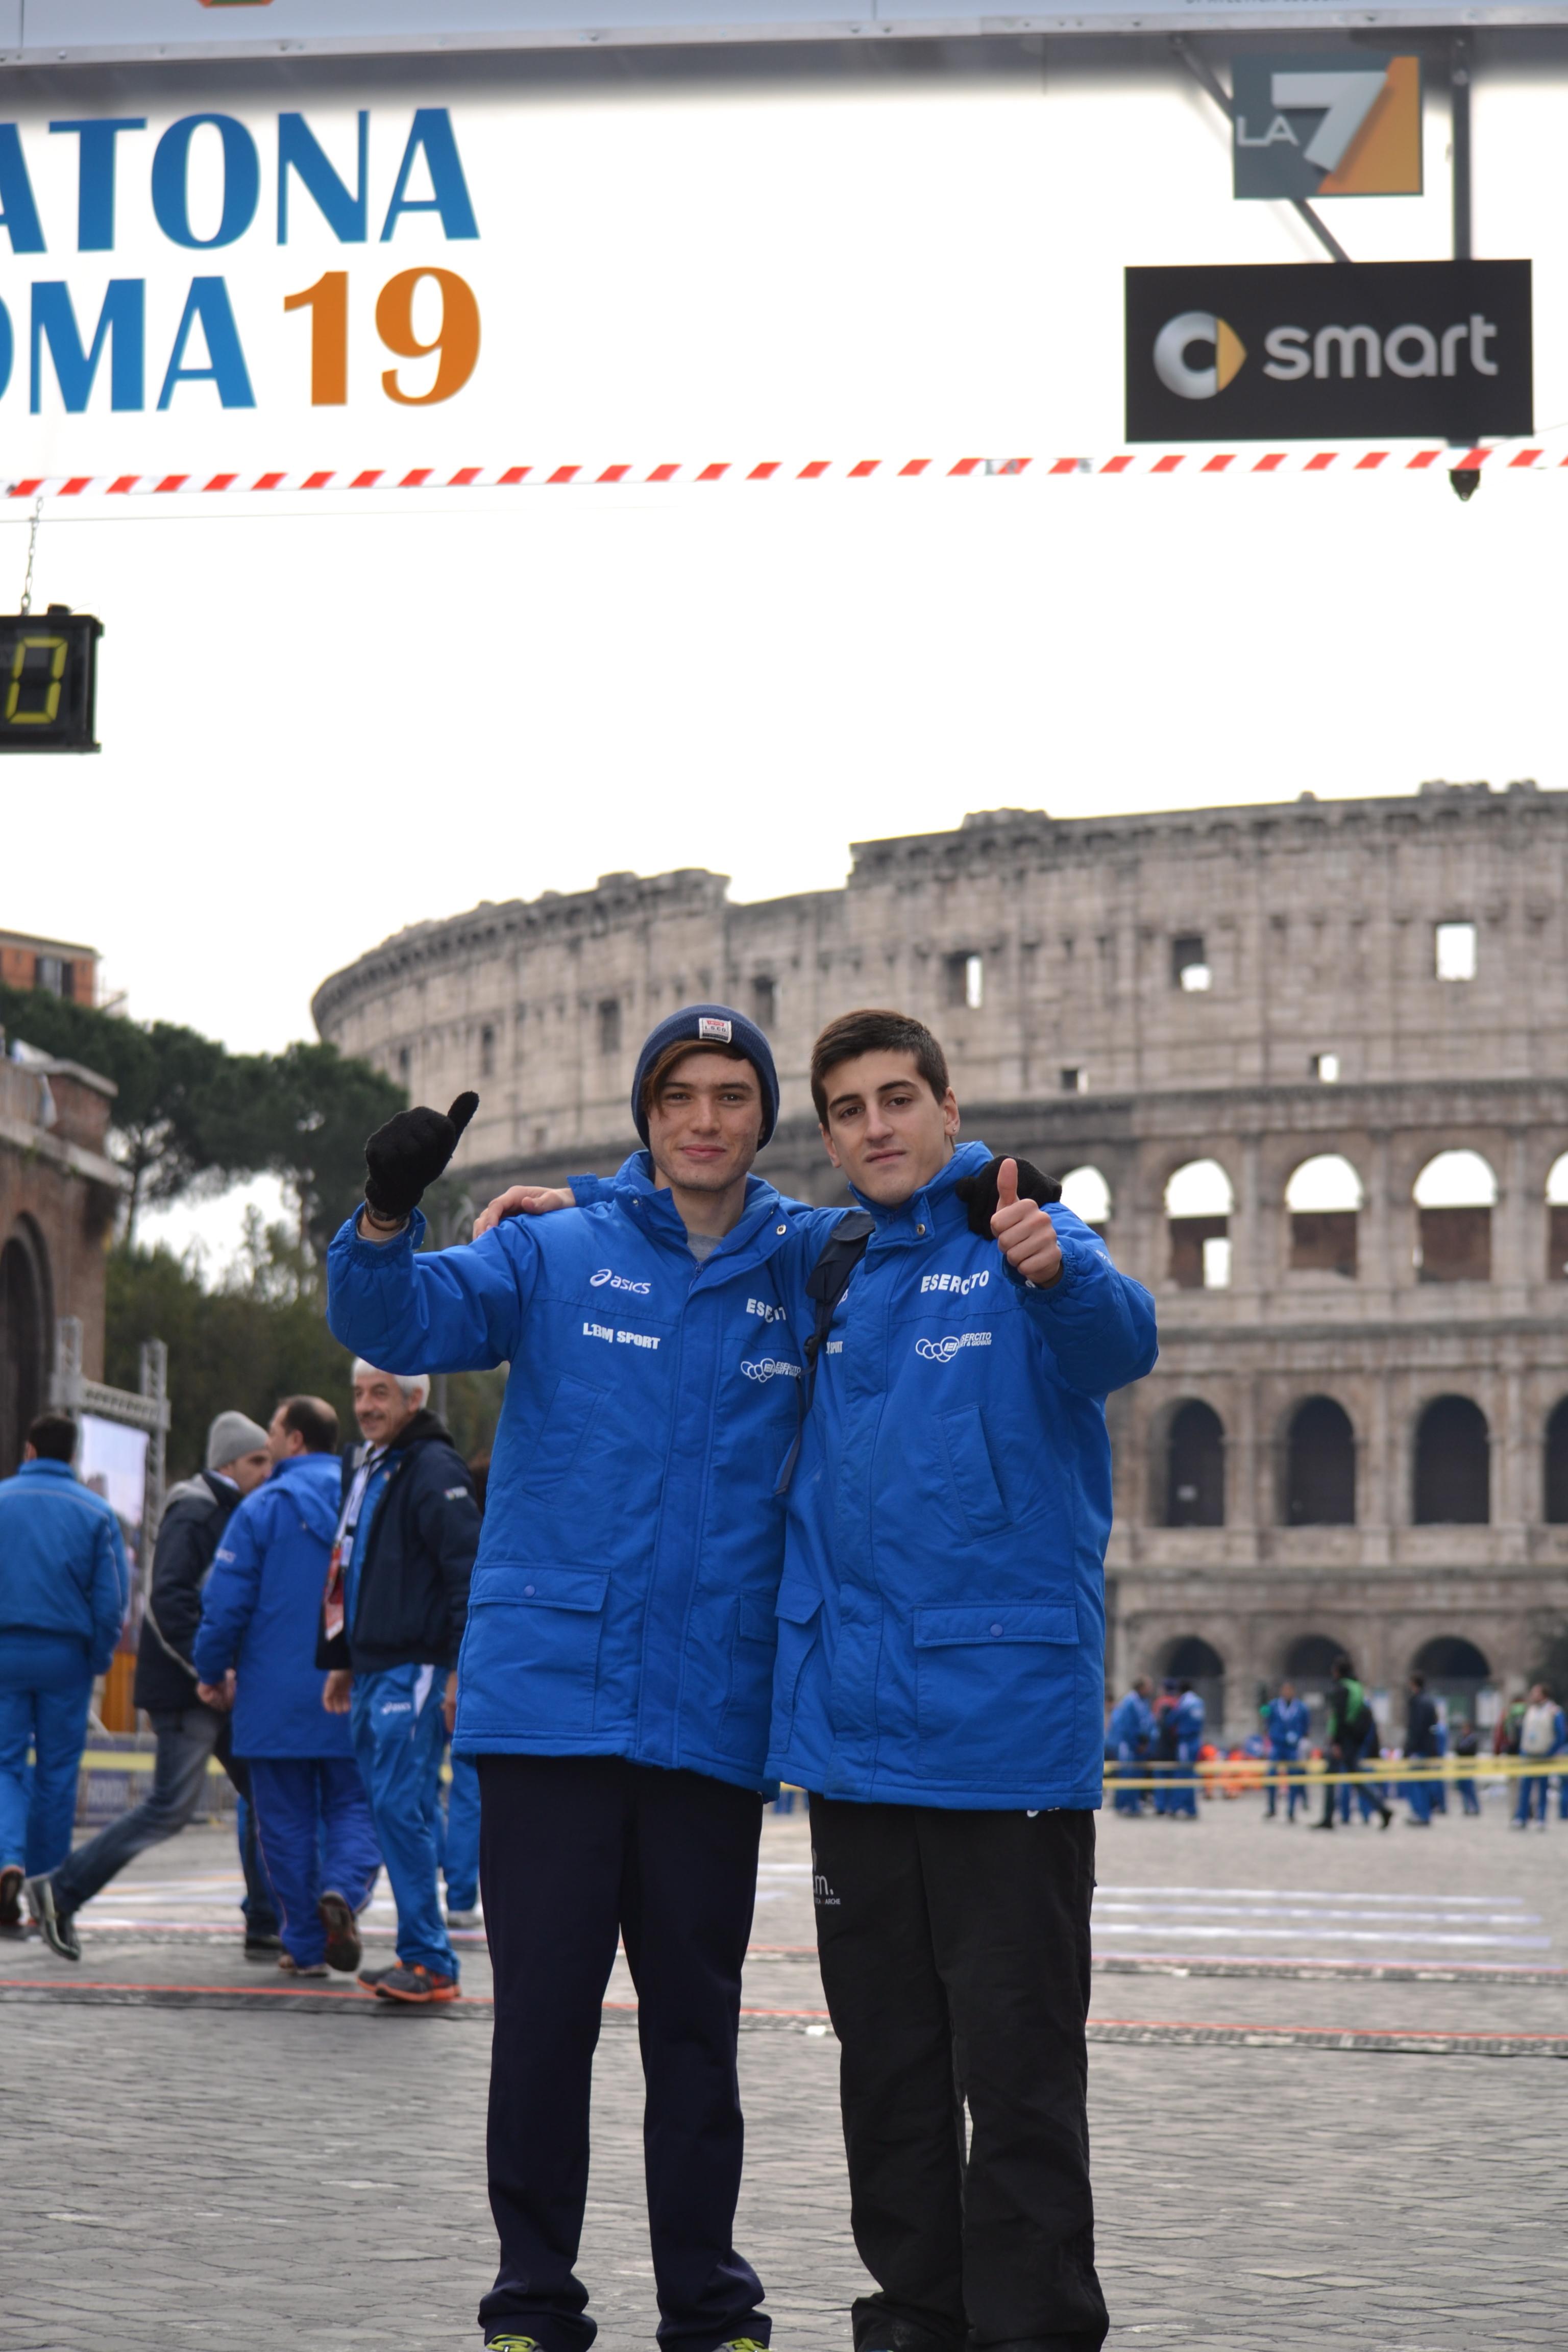 maratona-di-roma-2013-068